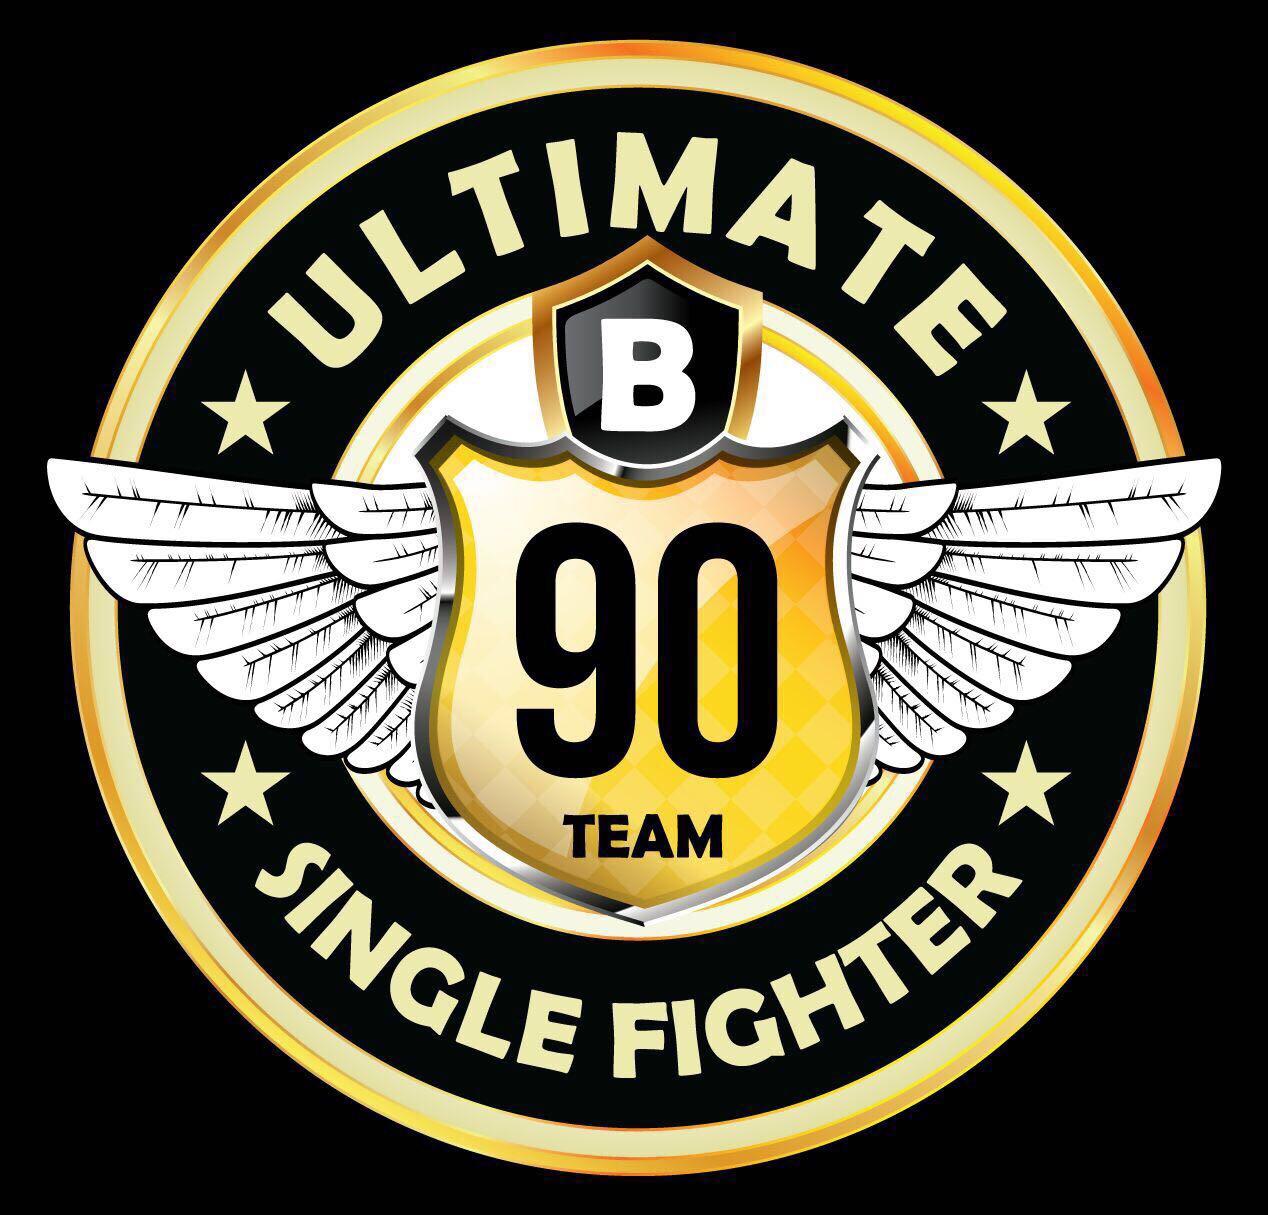 logo b 90